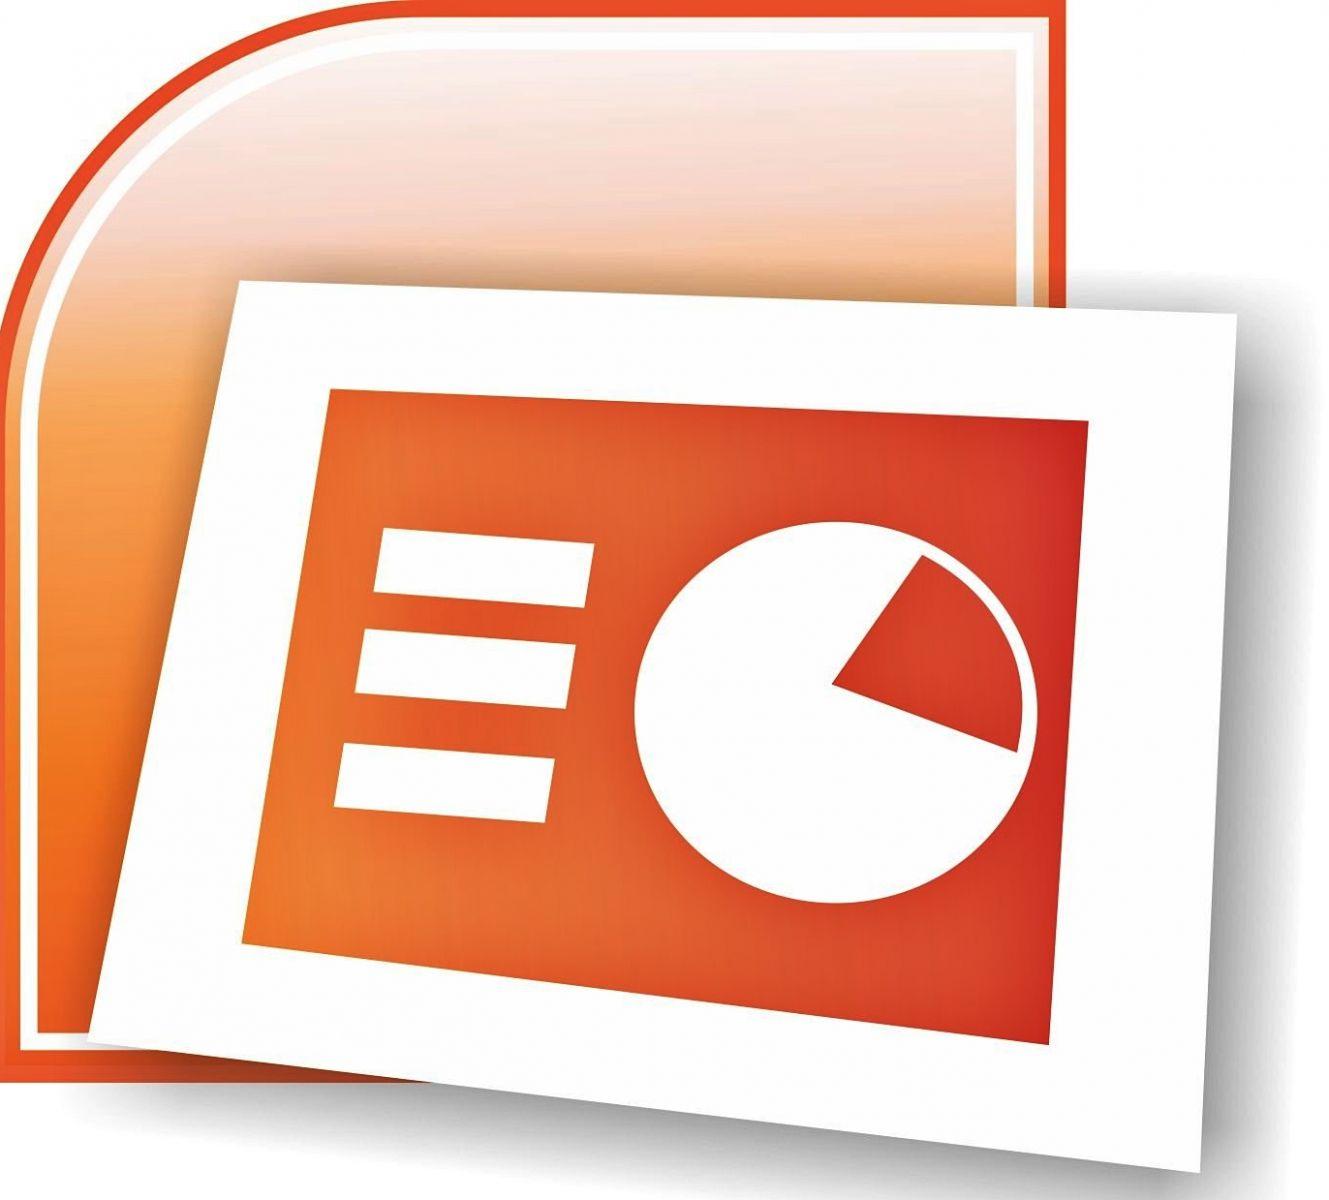 2007 ms download powerpoint ebook